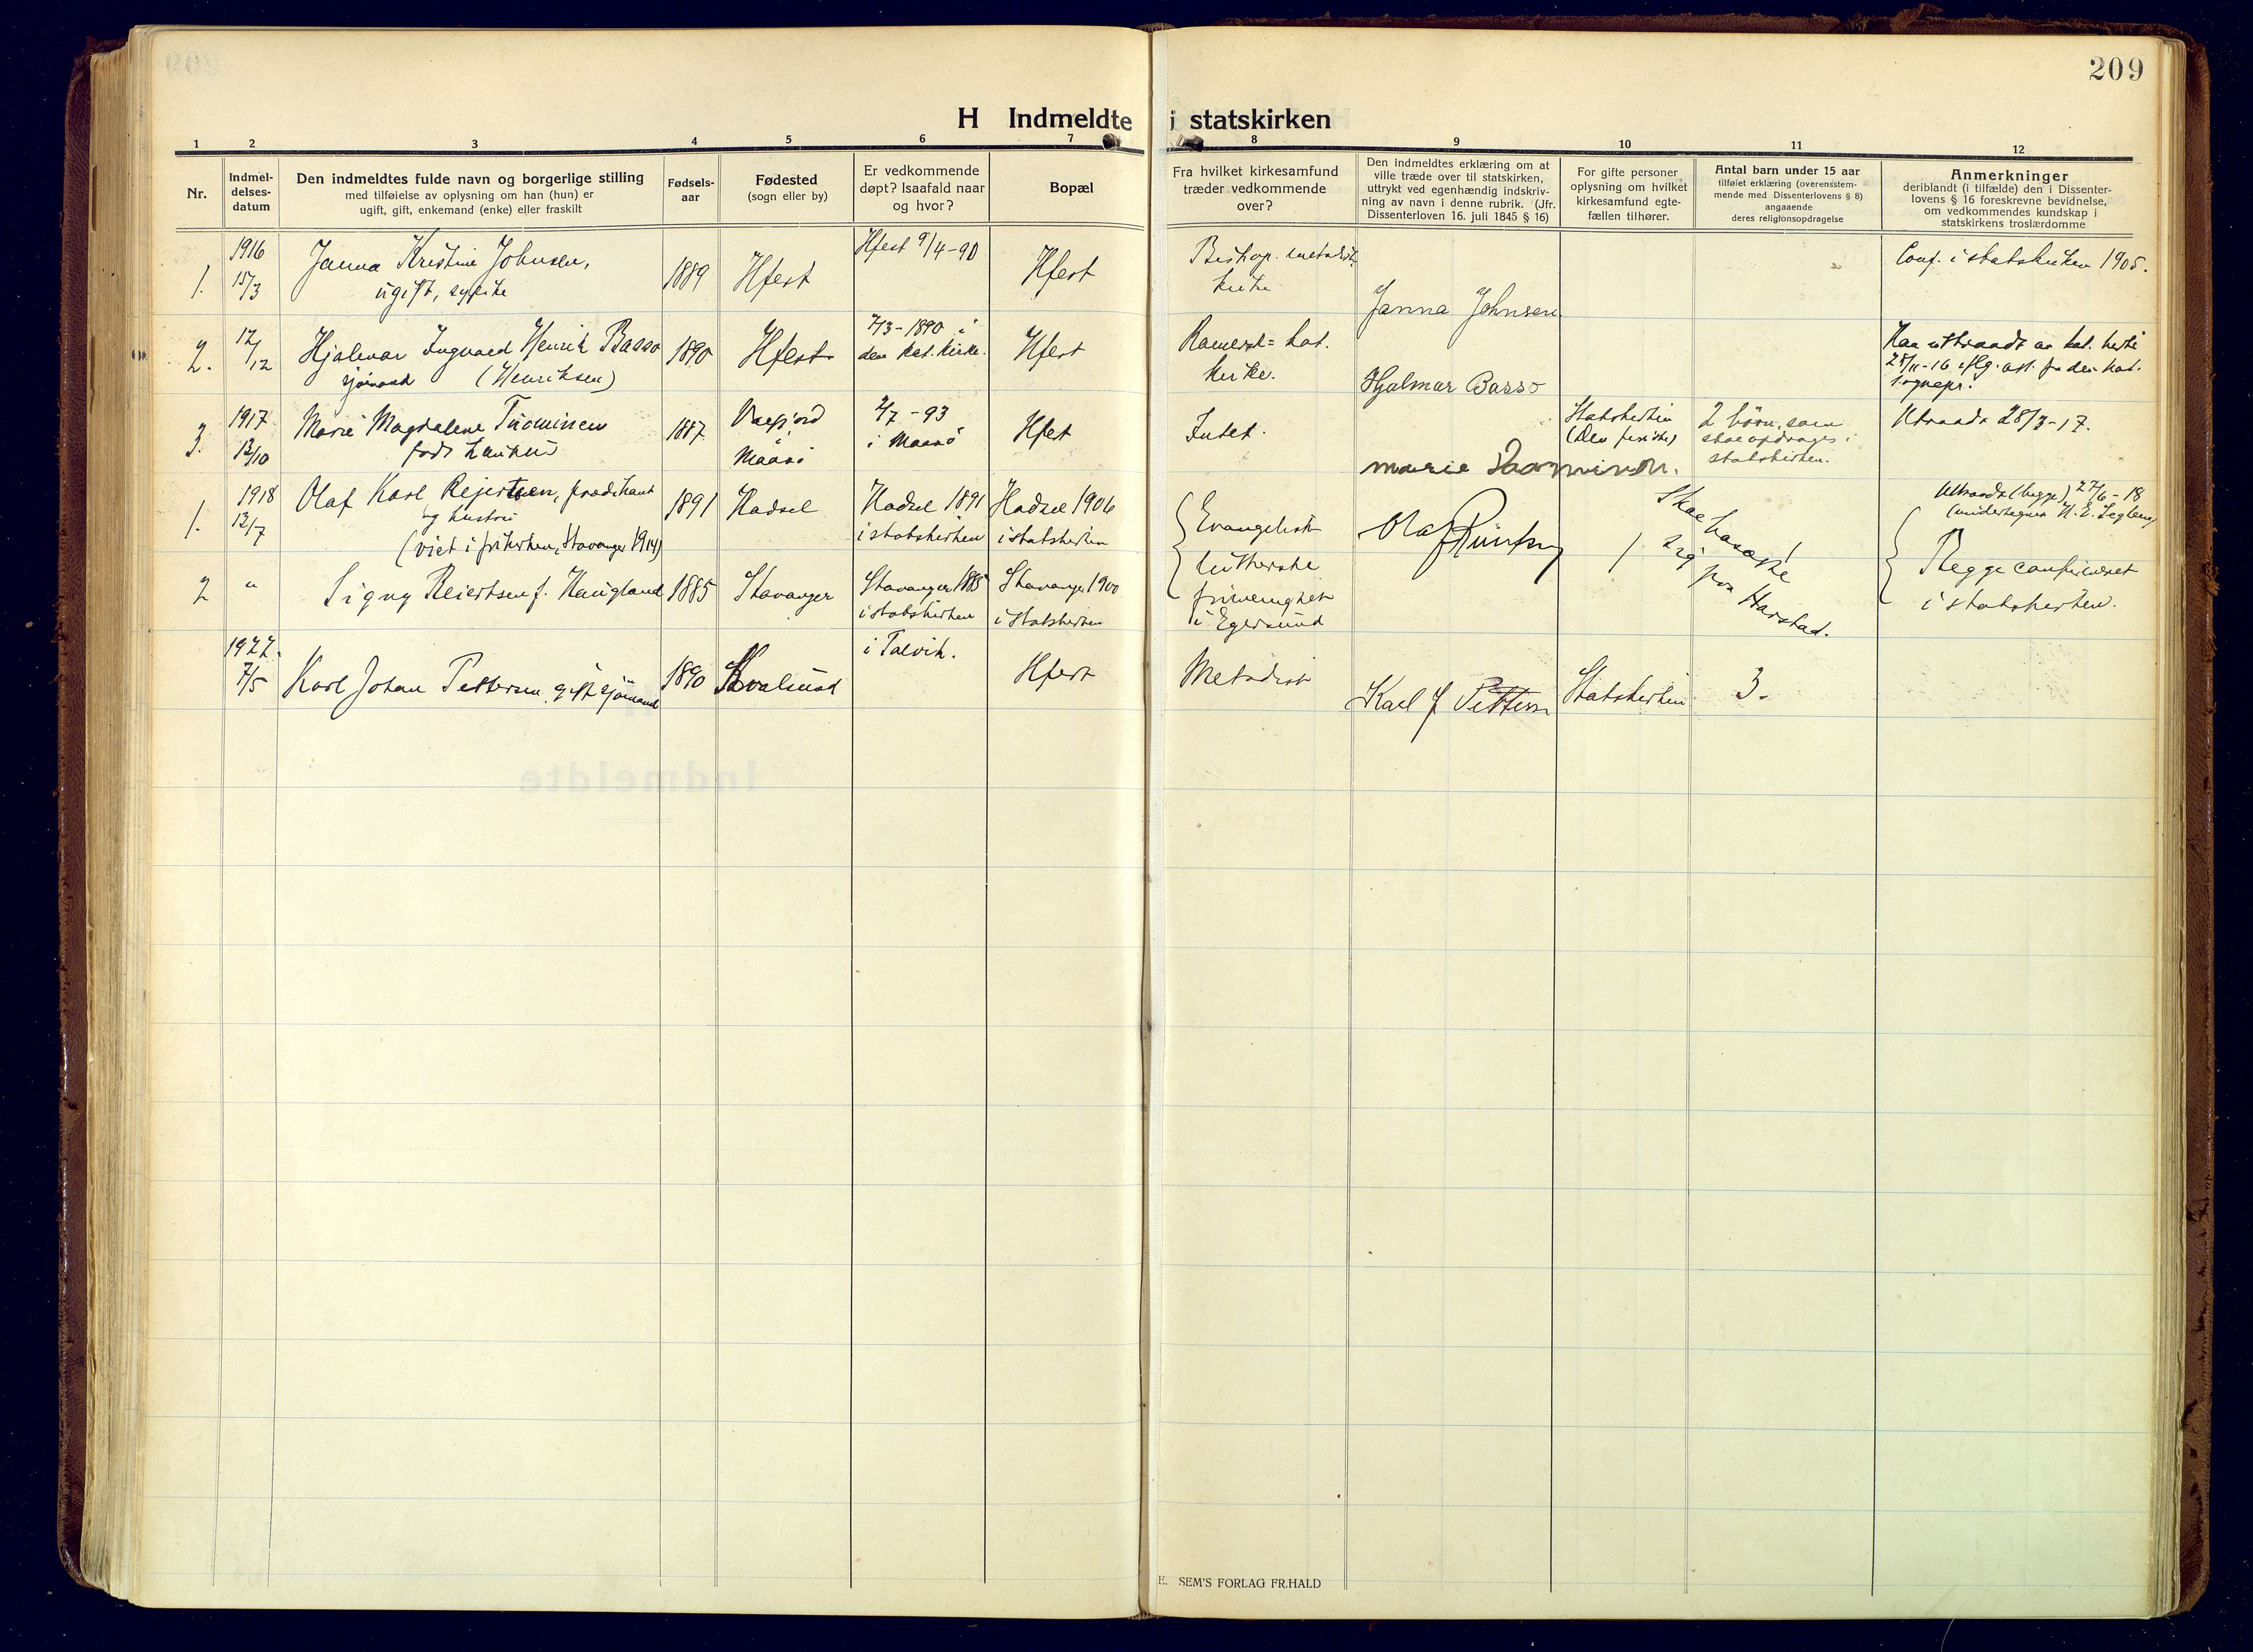 SATØ, Hammerfest sokneprestembete, Ministerialbok nr. 15, 1916-1923, s. 209